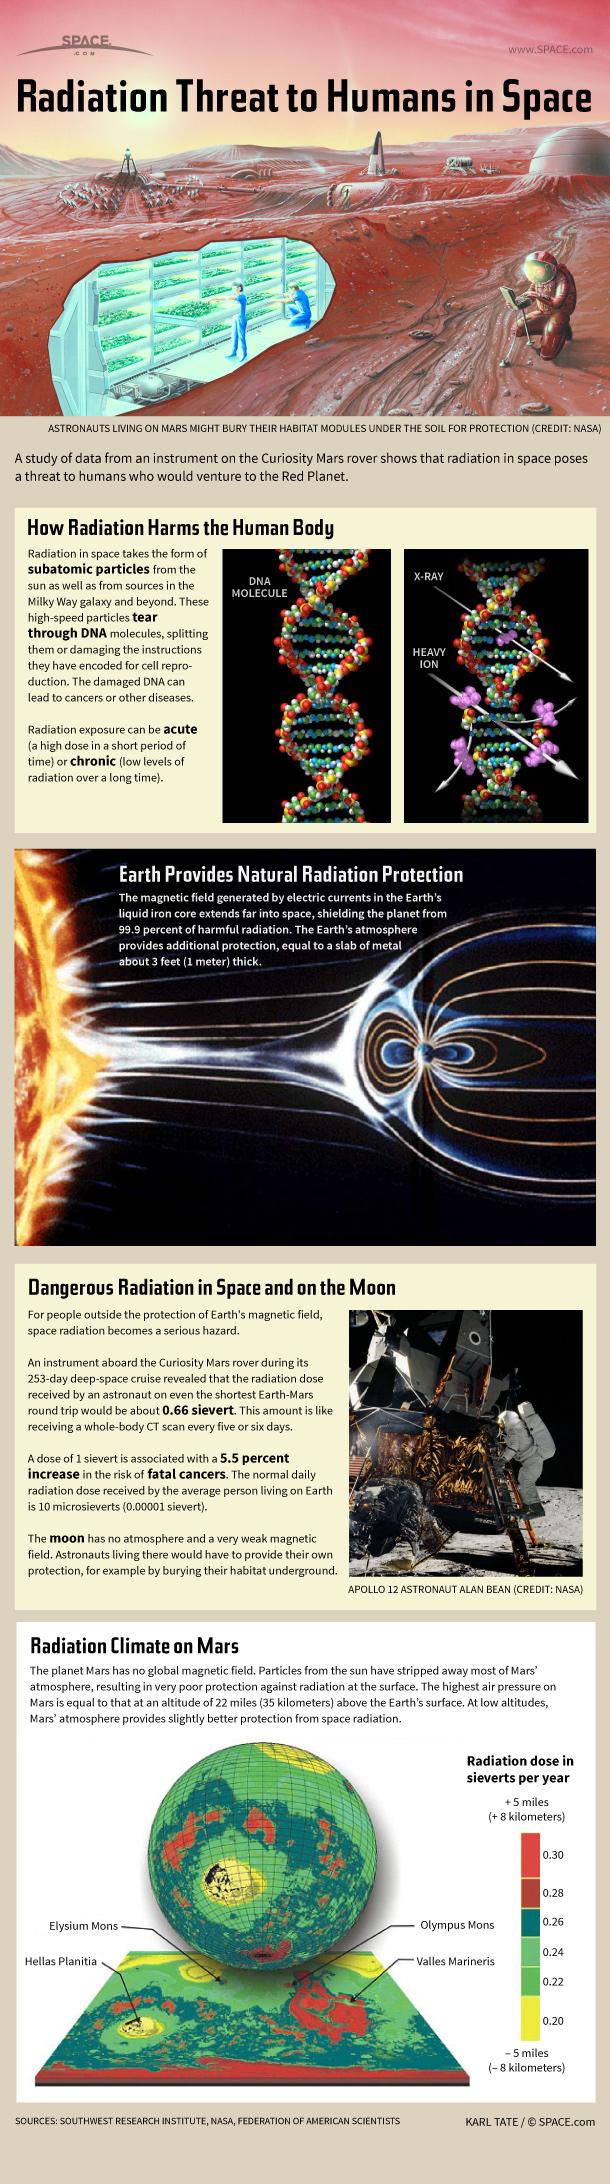 radiation-space-danger-130529b-02.jpg?interpolation=lanczos-none&downsize=600:*